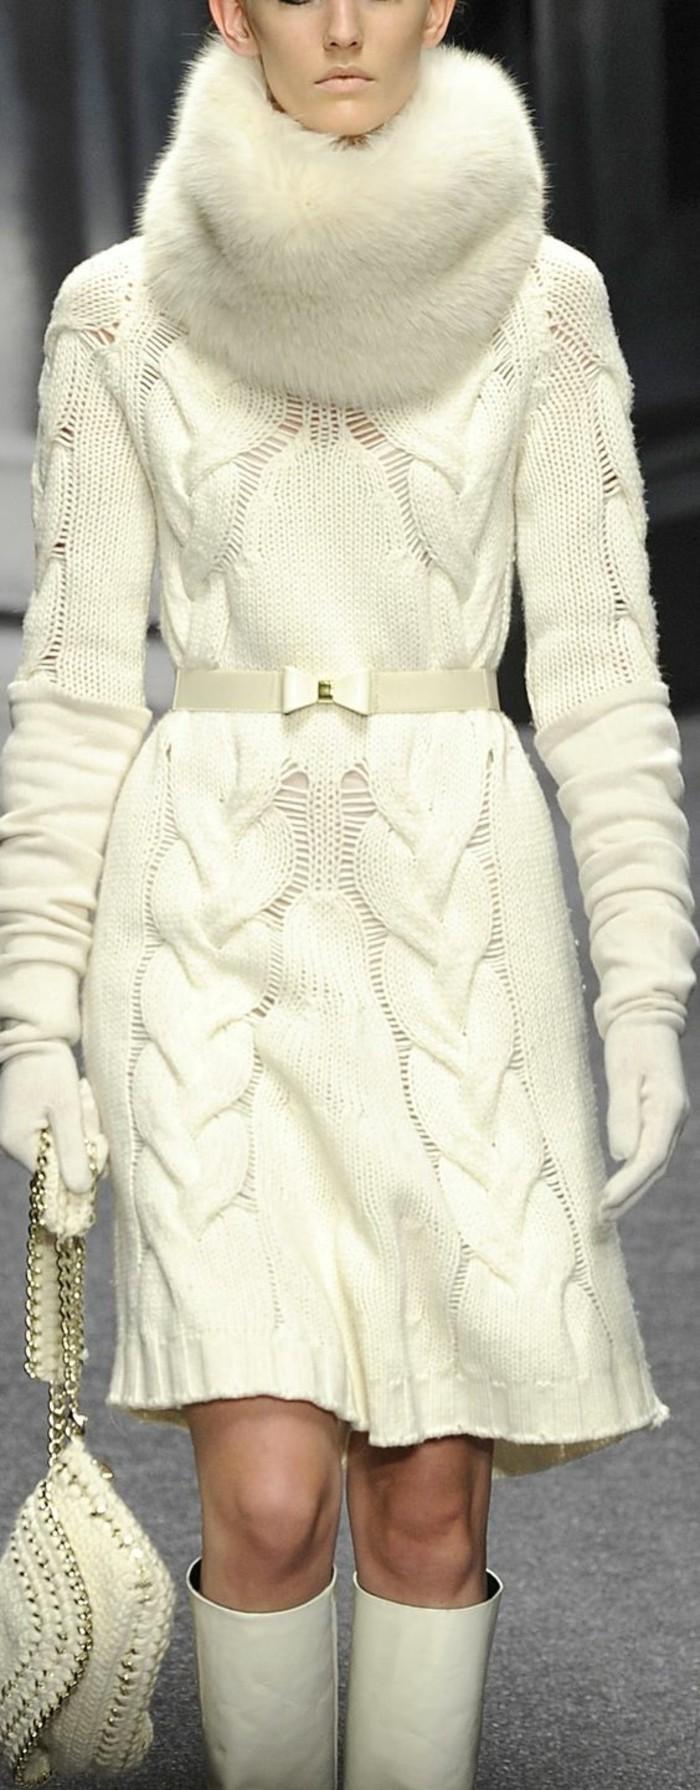 Robe sans manche blanche porte